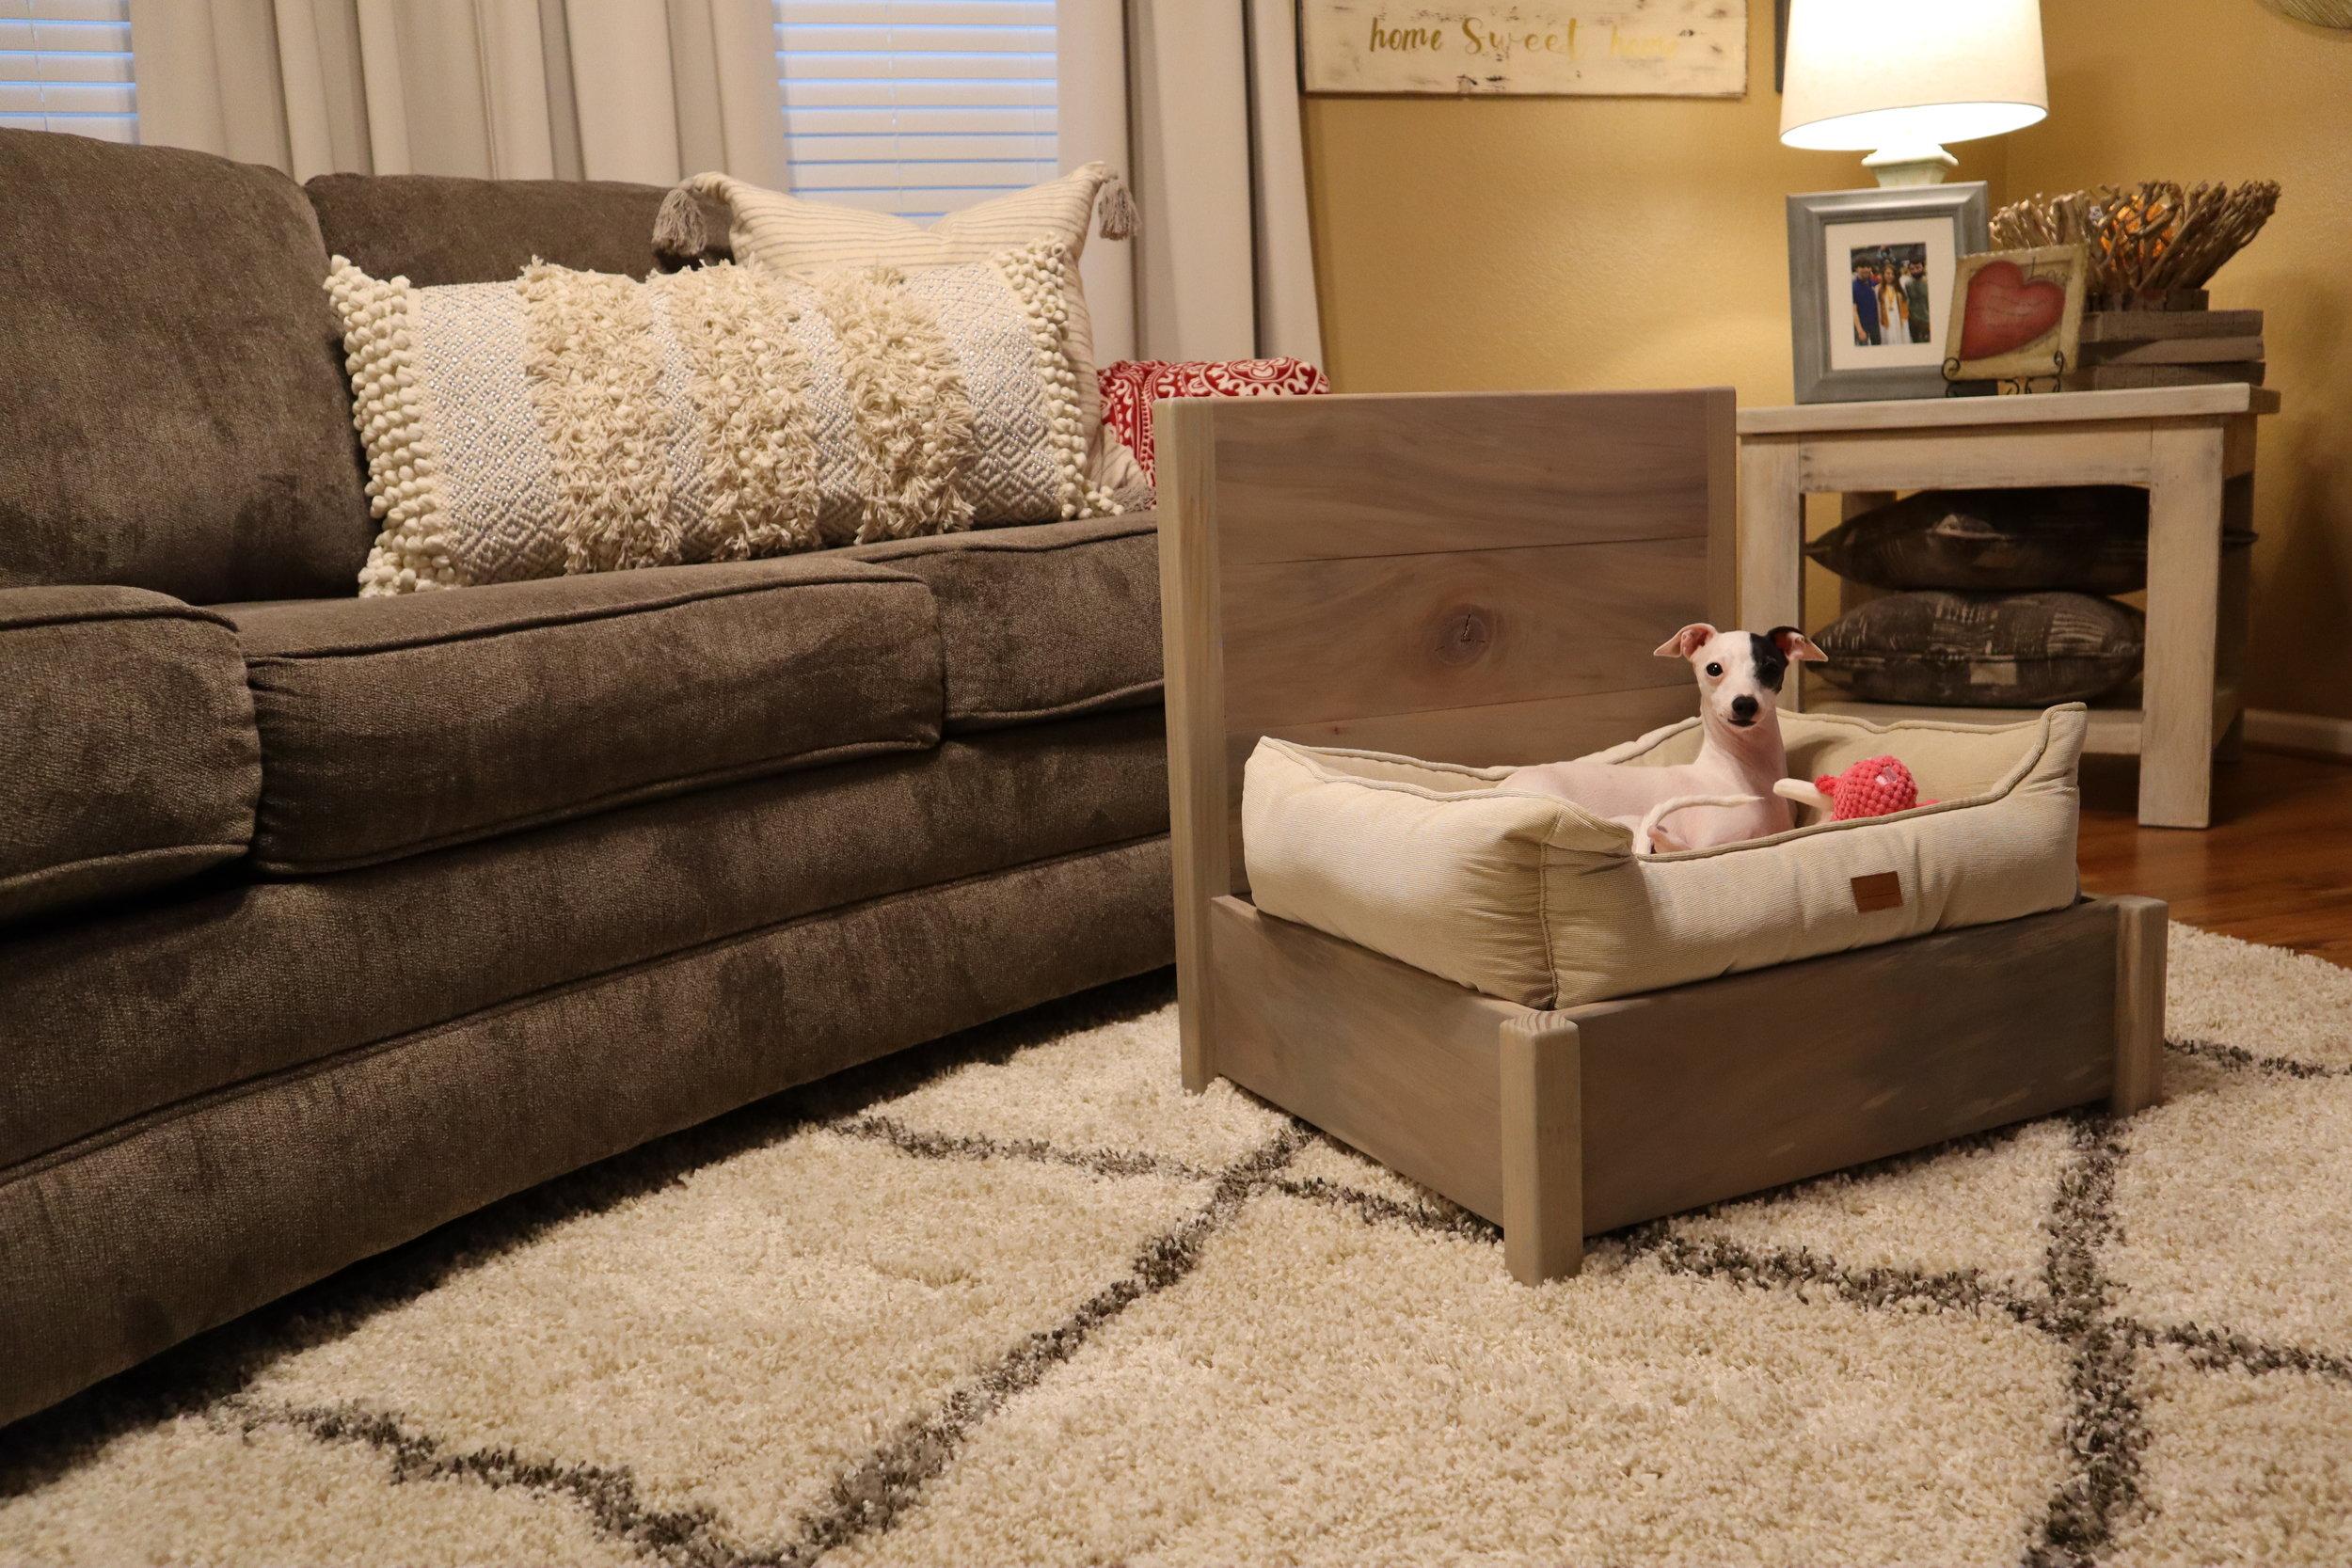 bed for italian greyhound.JPG